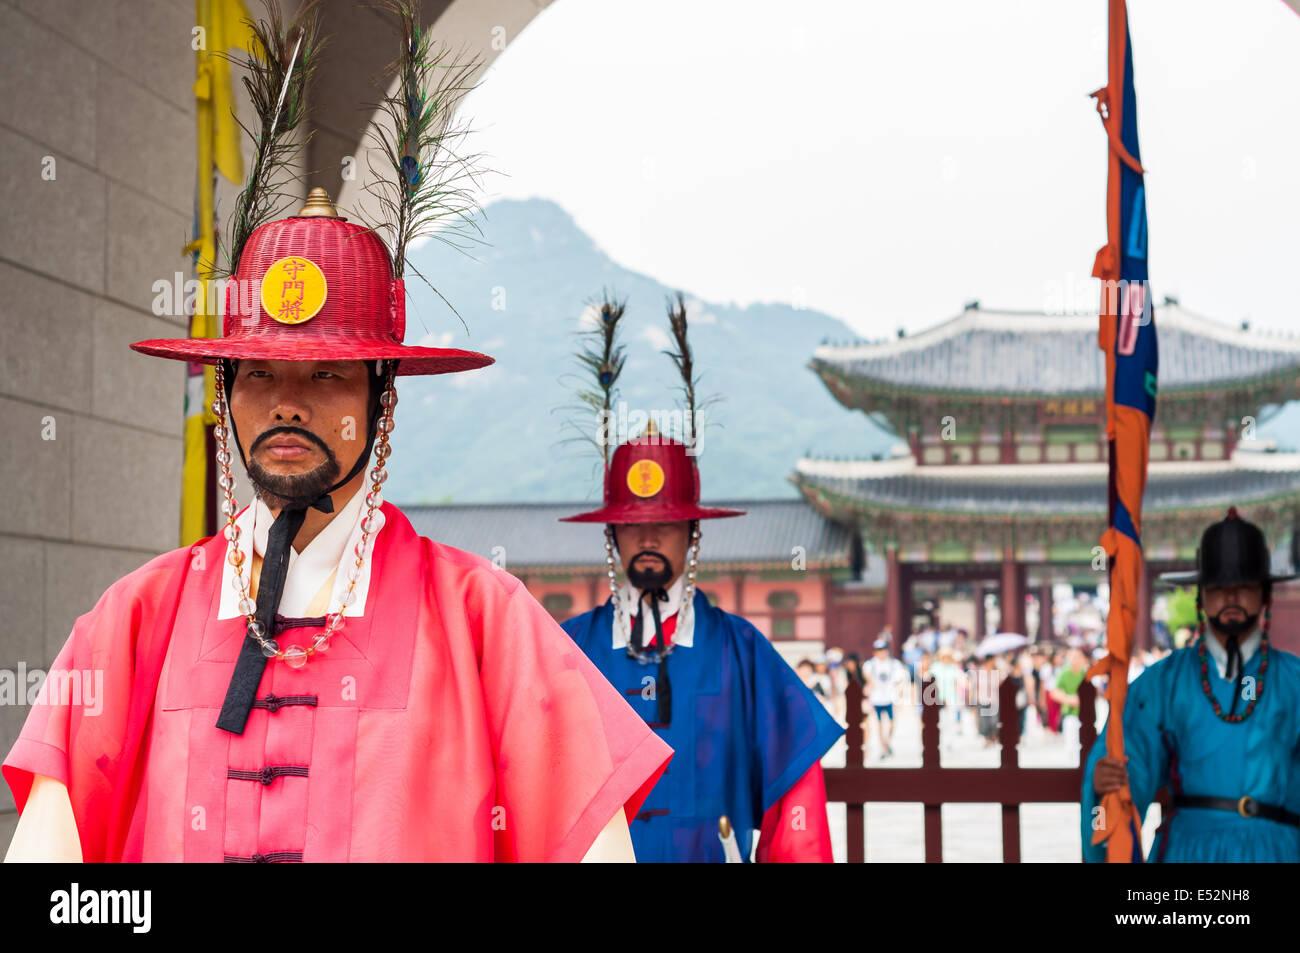 A royal guard keeps watch at Gyeongbokgung Palace on July 5, 2014 in Seoul, South Korea. - Stock Image